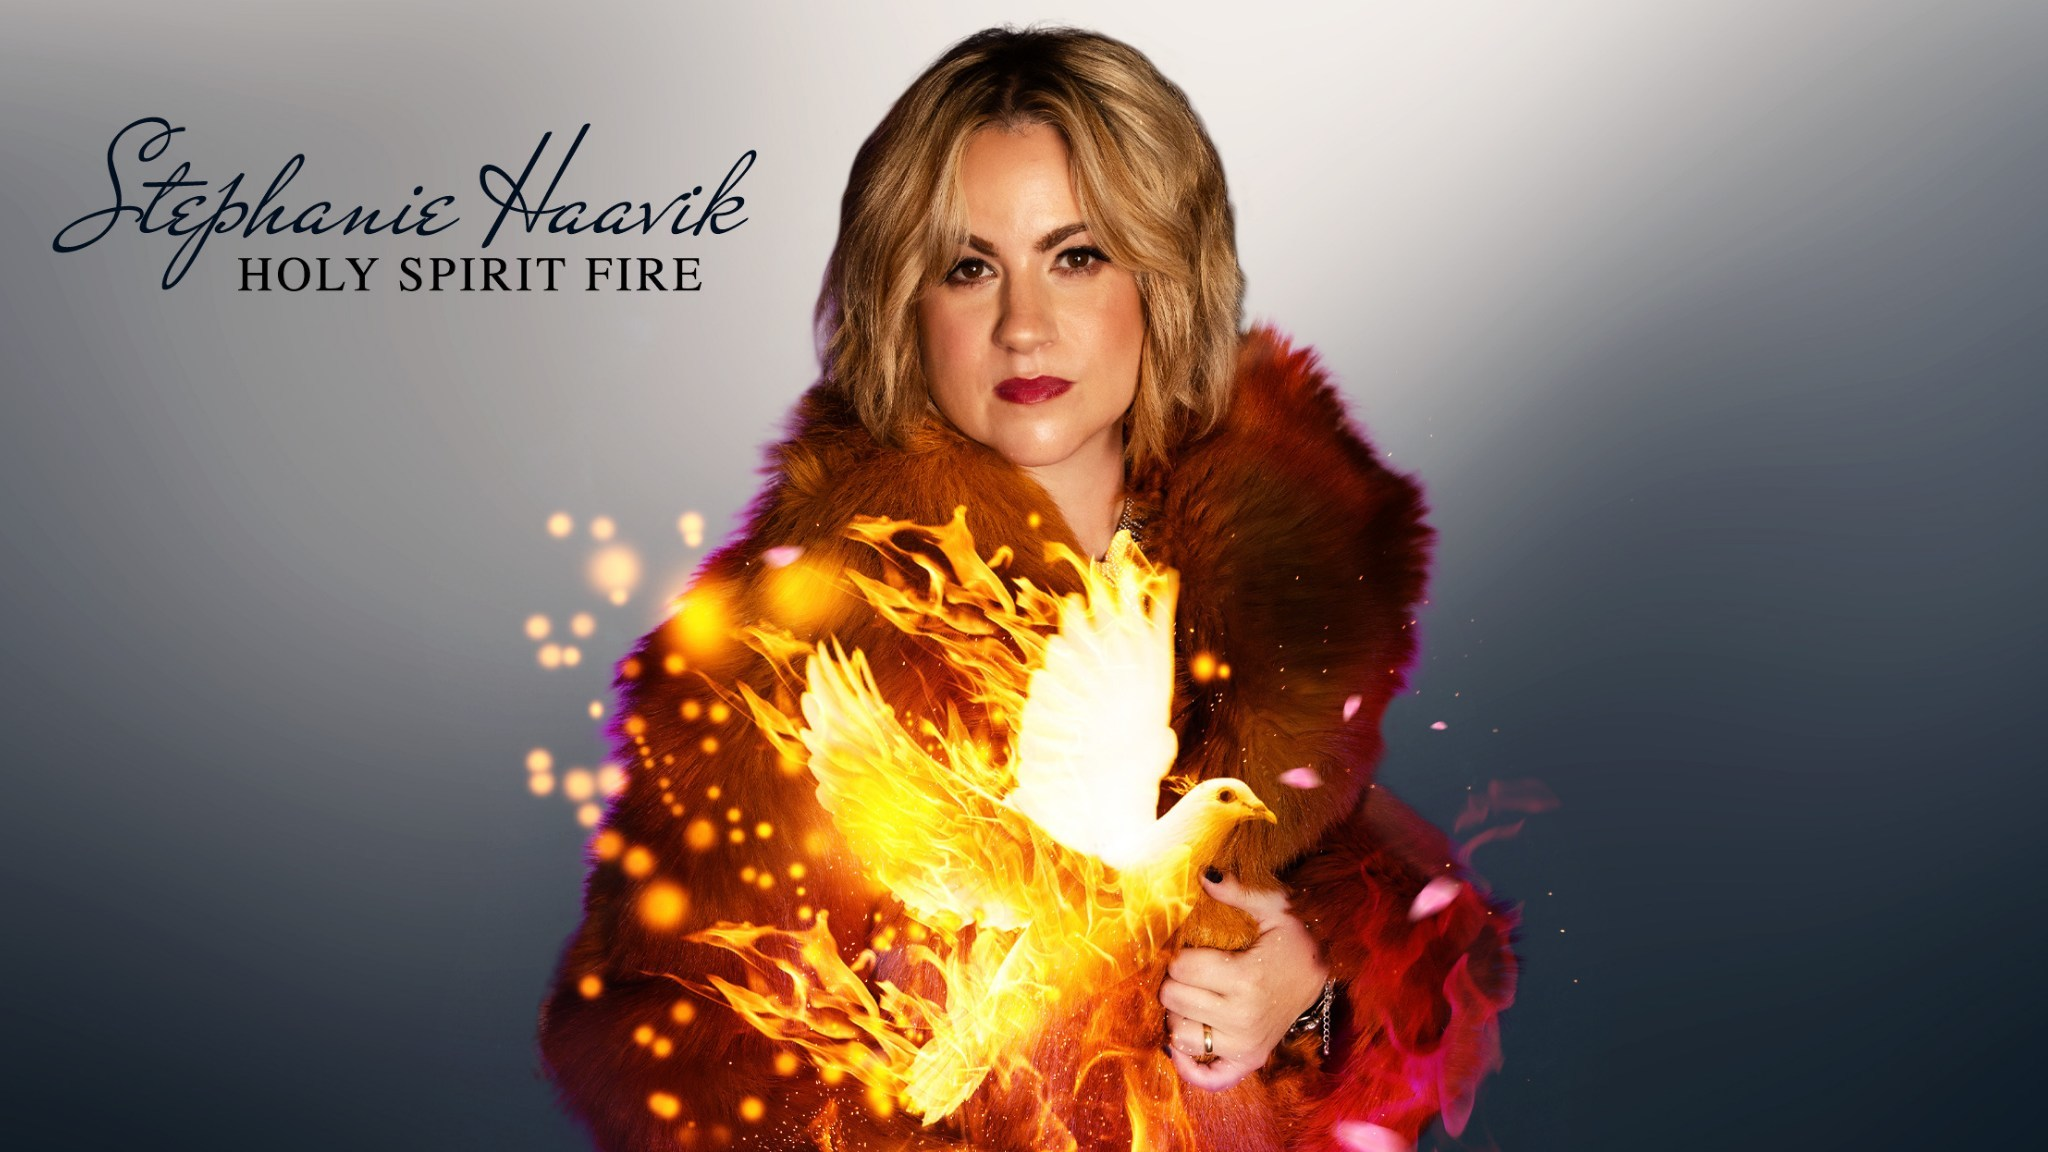 Stephanie Haavik - Holy Spirit Fire